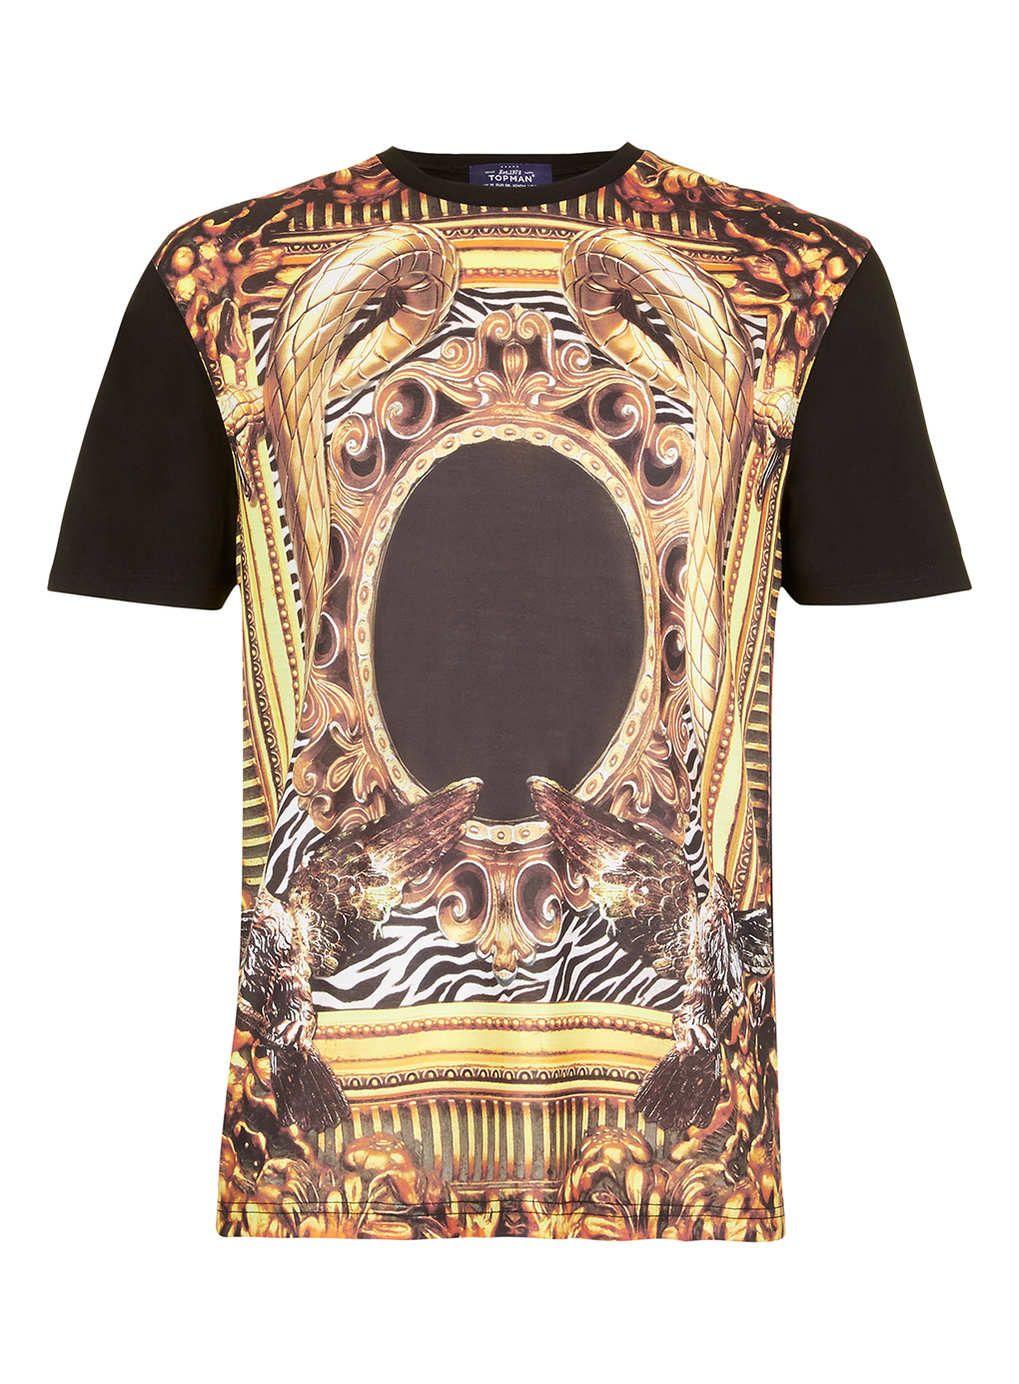 Black t shirt topman - Black Gold Frame T Shirt T Shirts Vests New In